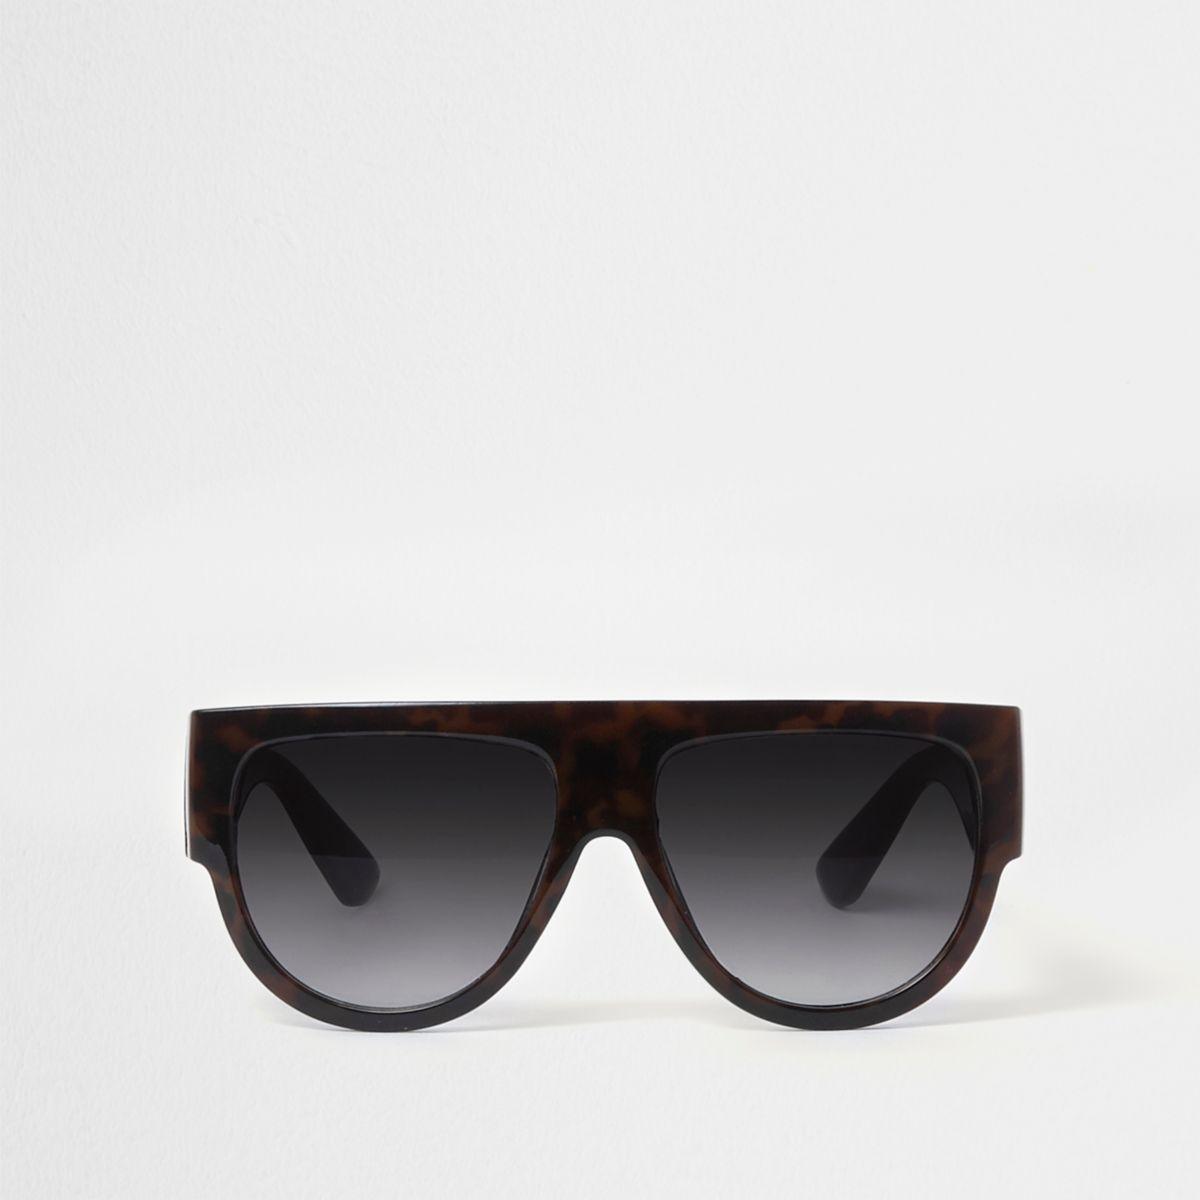 Black flat top tortoiseshell sunglasses